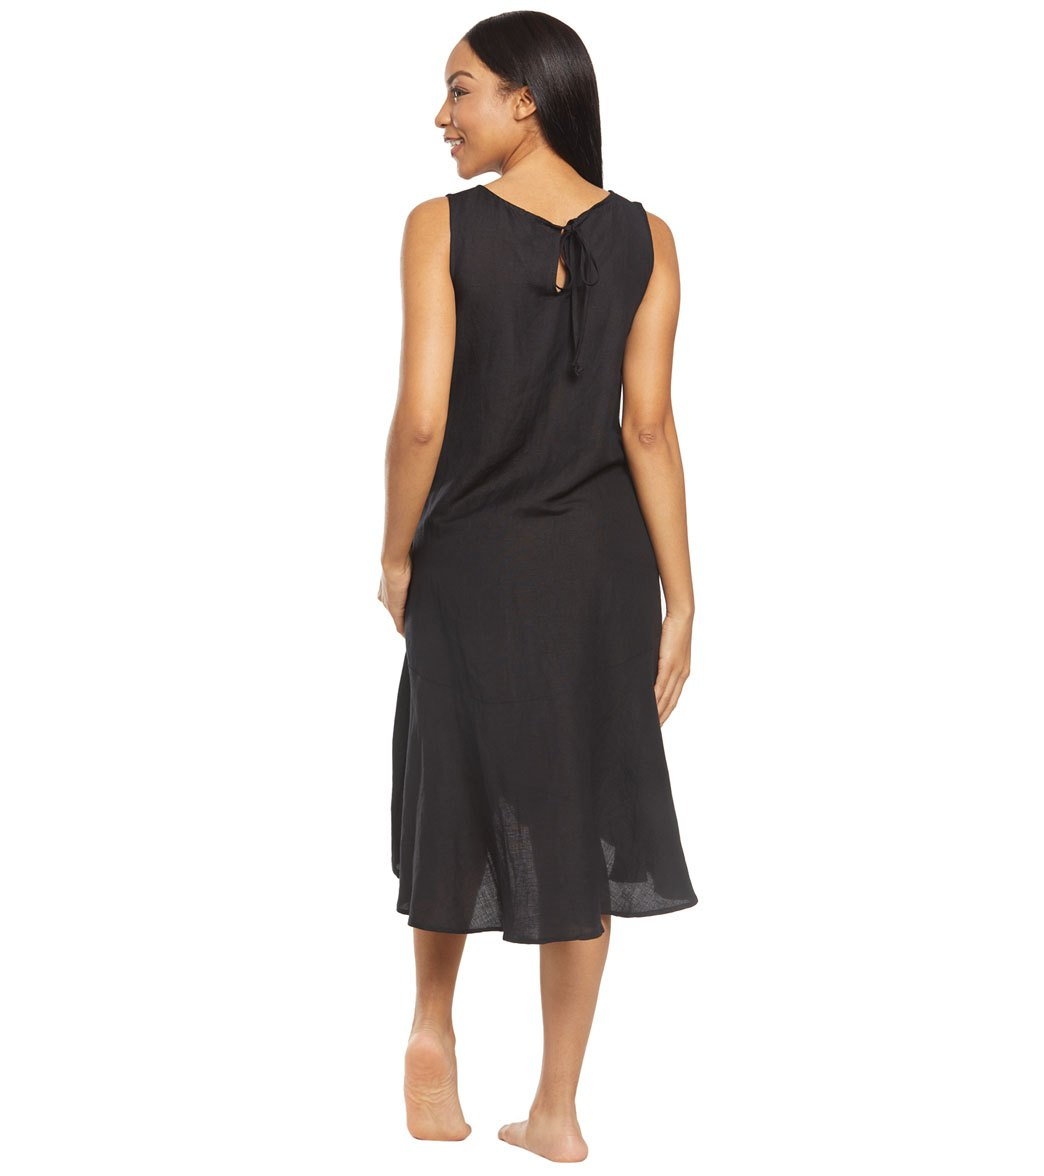 4713475cd4 Tommy Bahama Linen Garment Dye Flounce Cover Up Dress at SwimOutlet ...